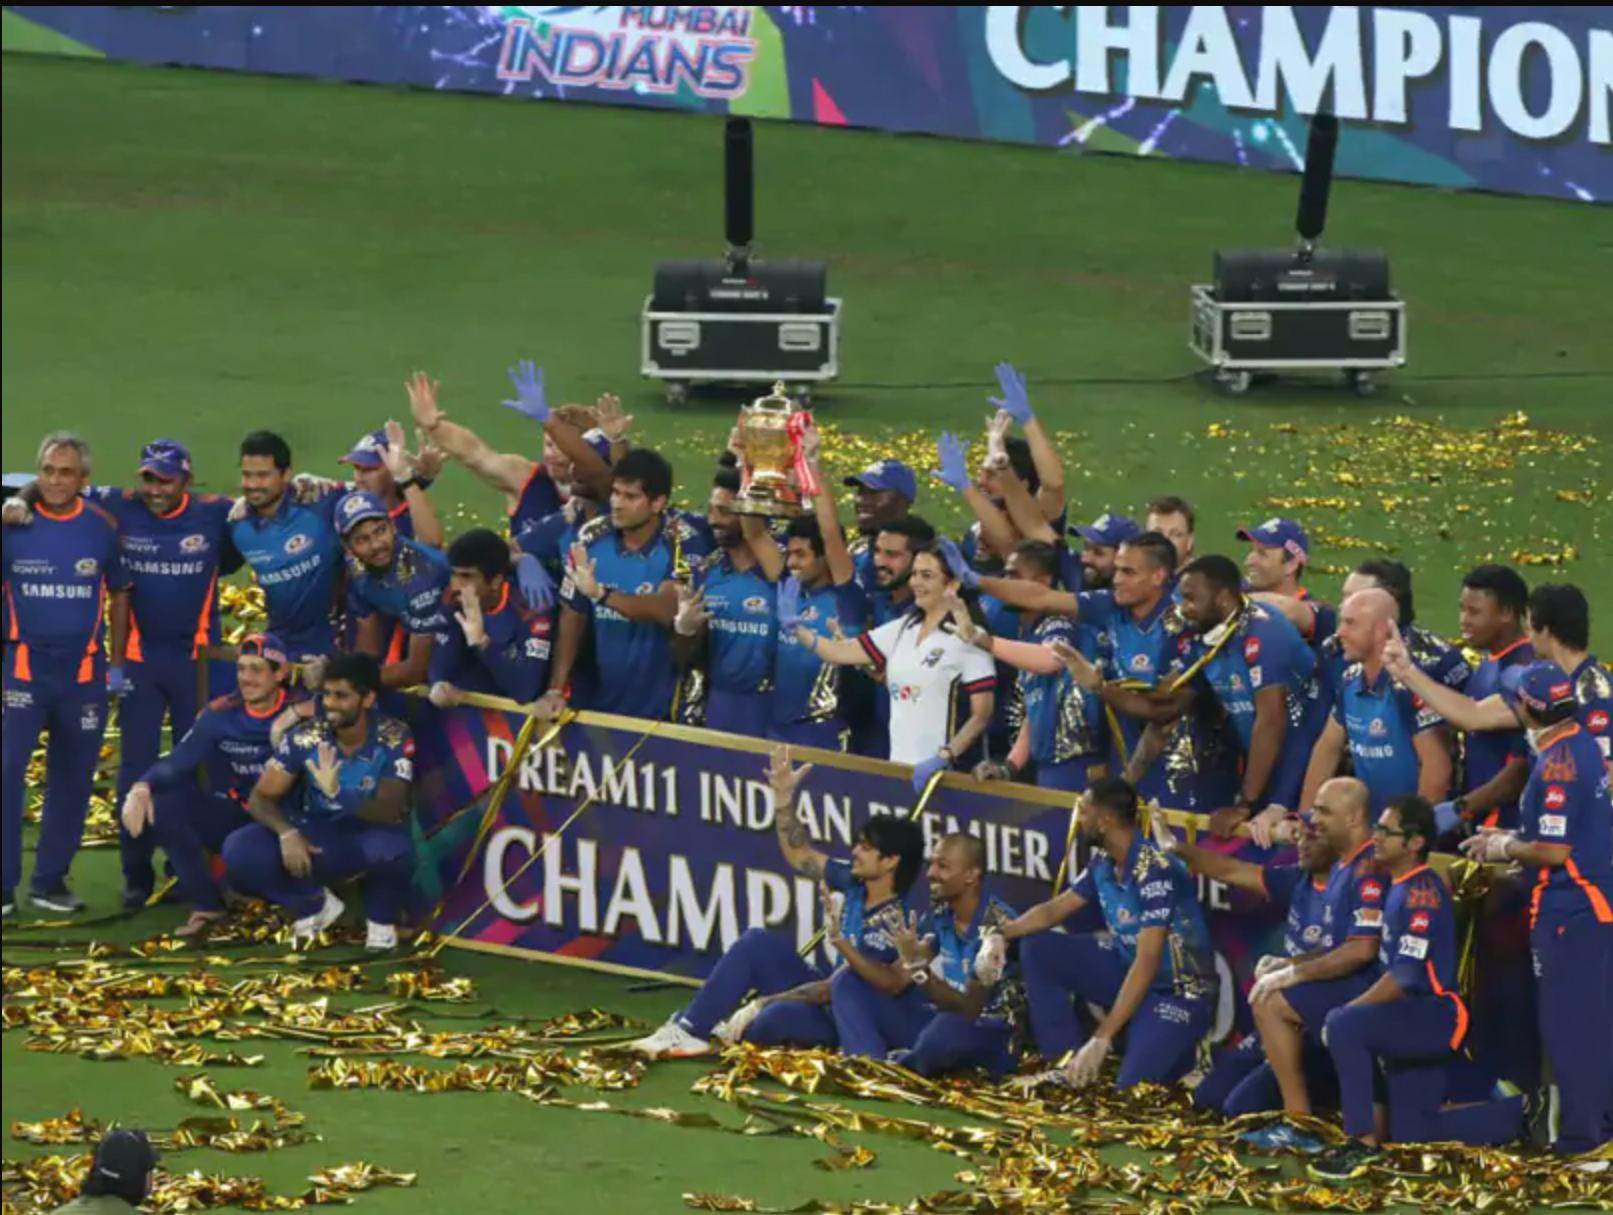 mumbai indians ipl 2020 champions